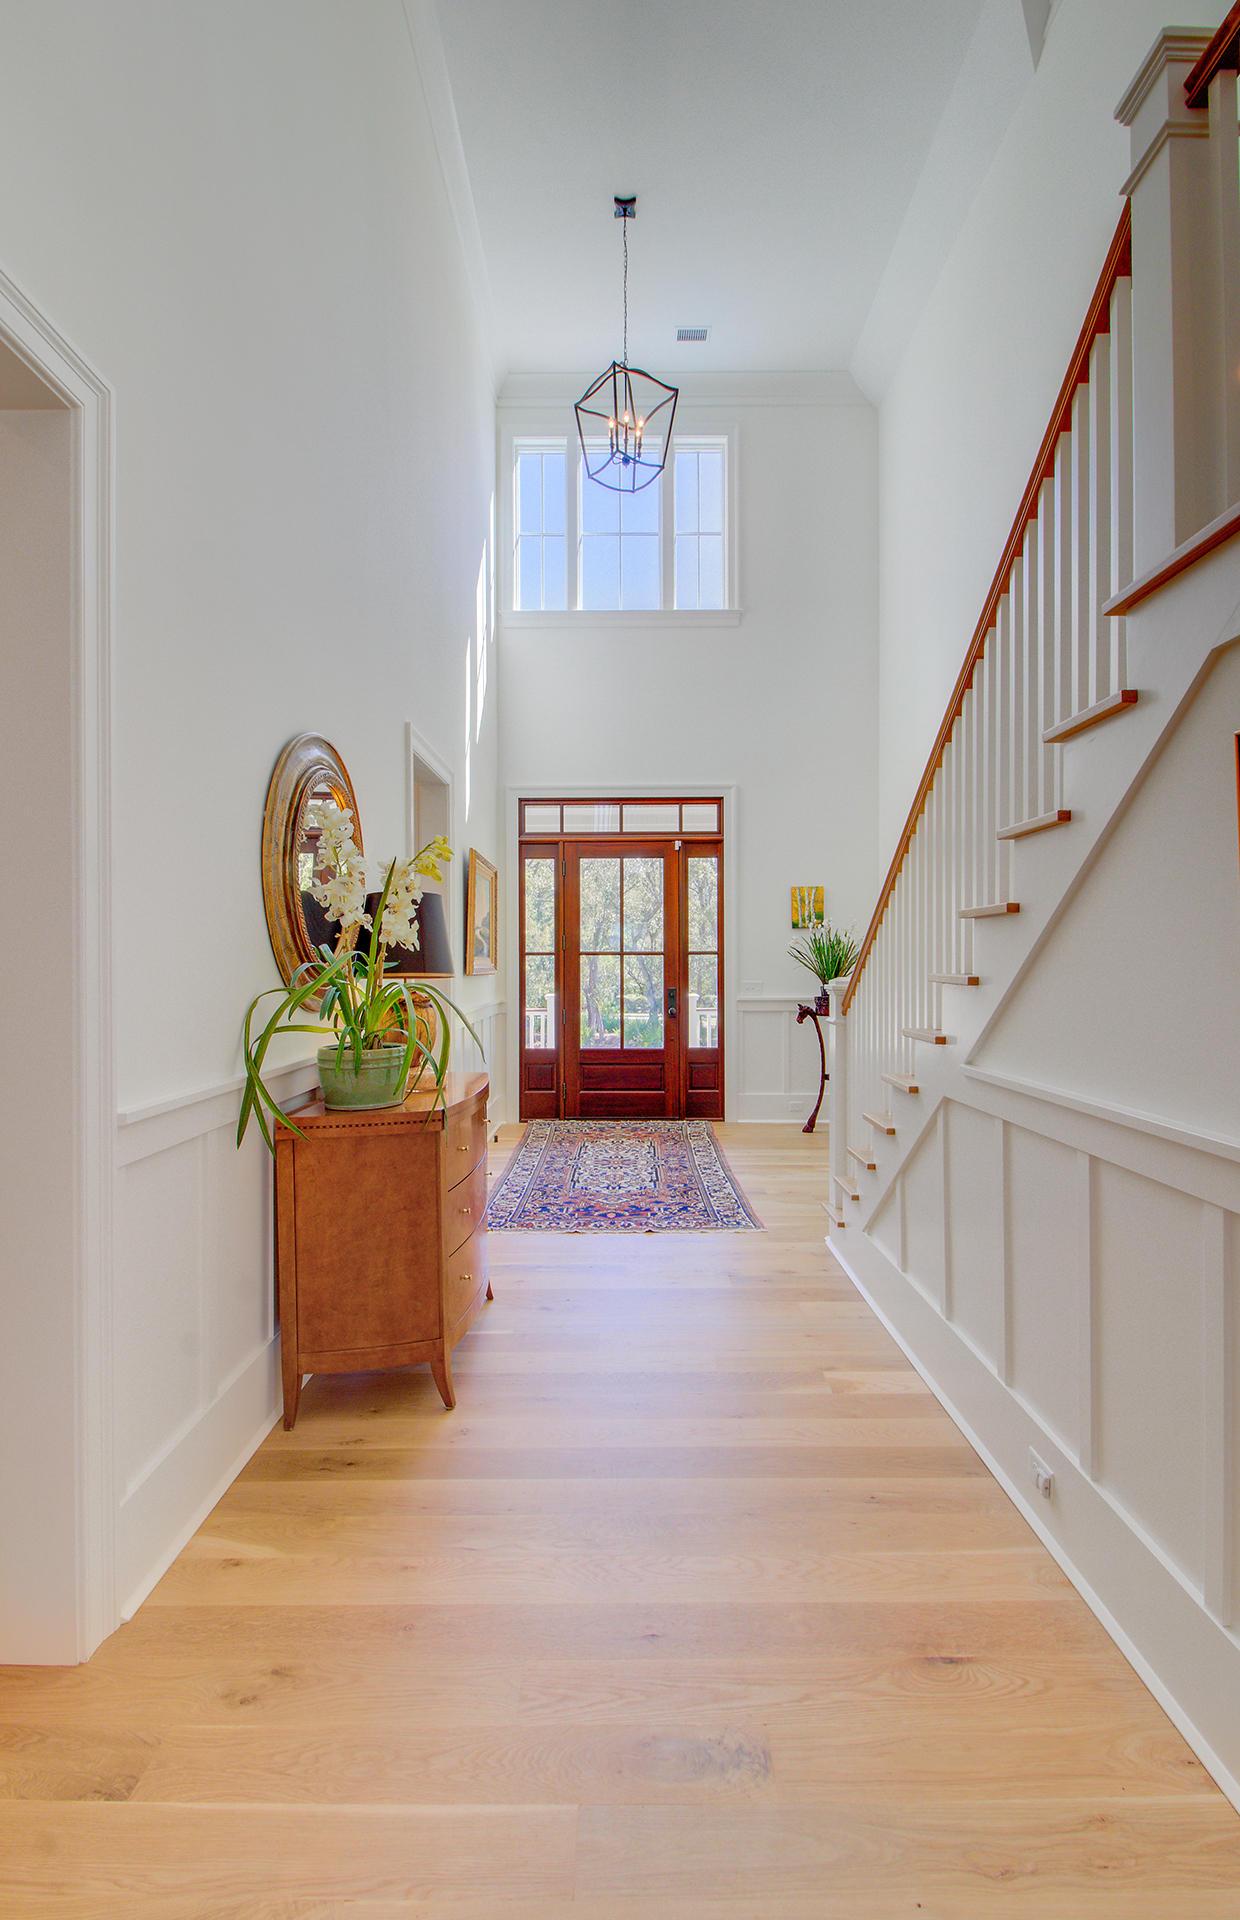 Beresford Hall Homes For Sale - 253 Grand Park, Charleston, SC - 17